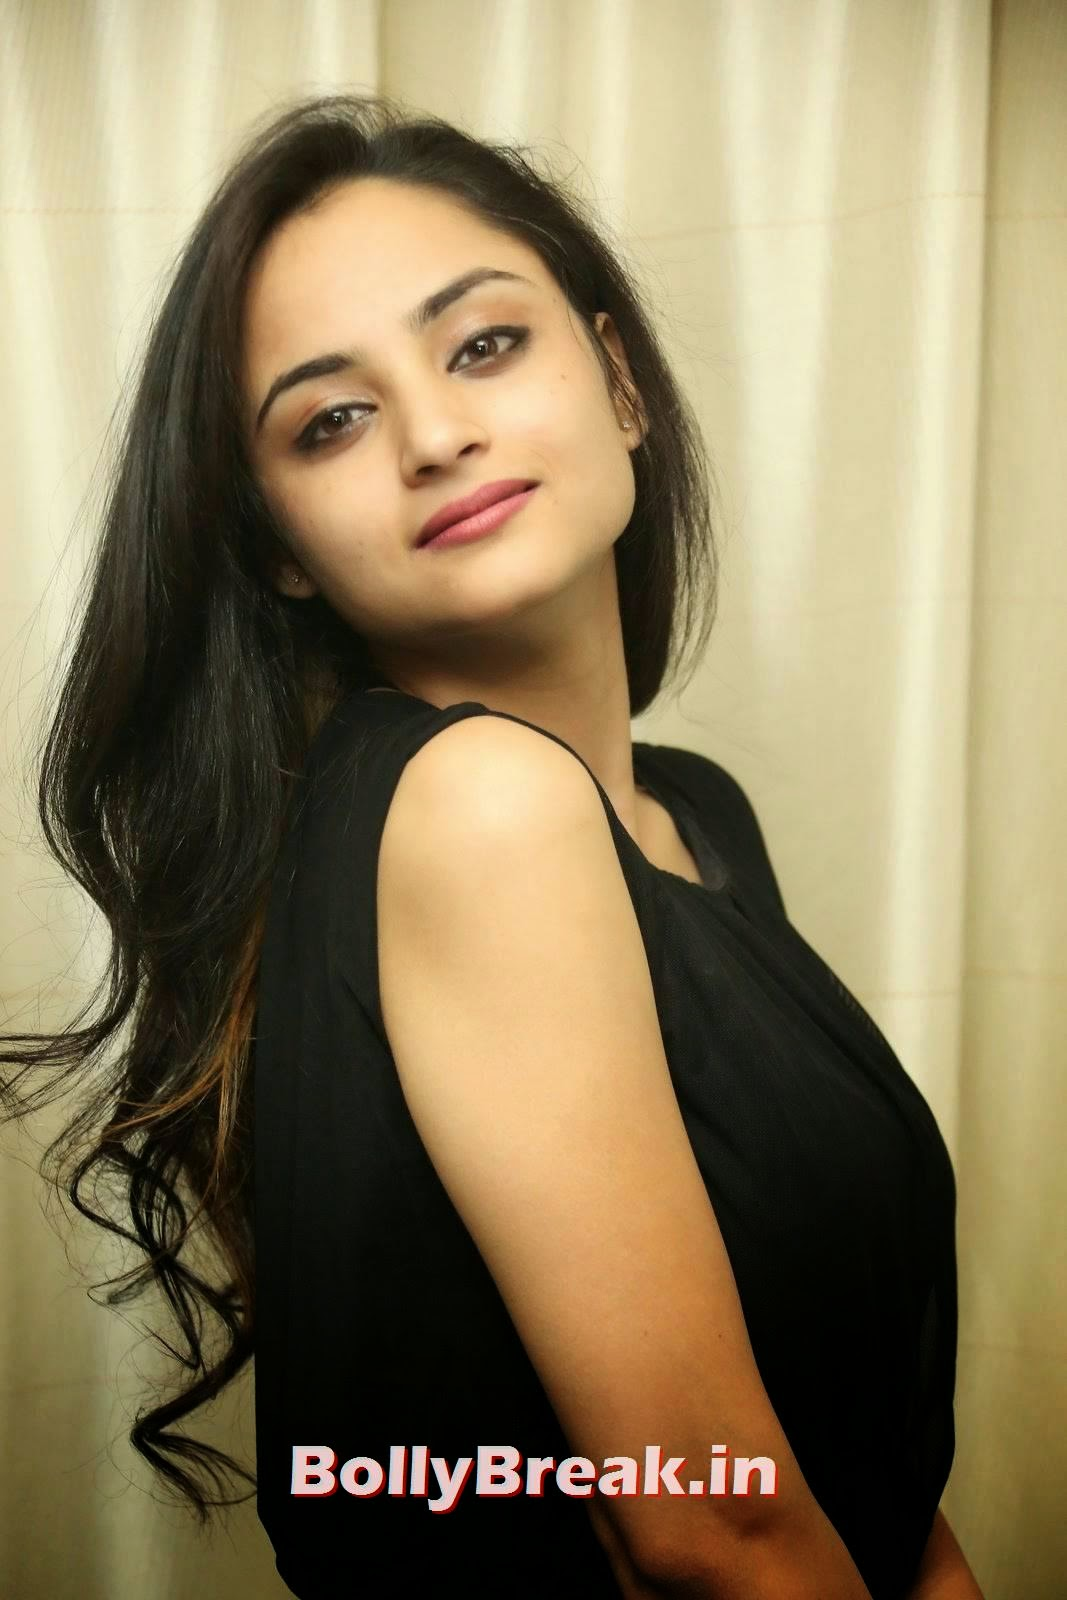 Madirakshi Pics, Actress Madirakshi Hot Pics in Skirt & Black Top